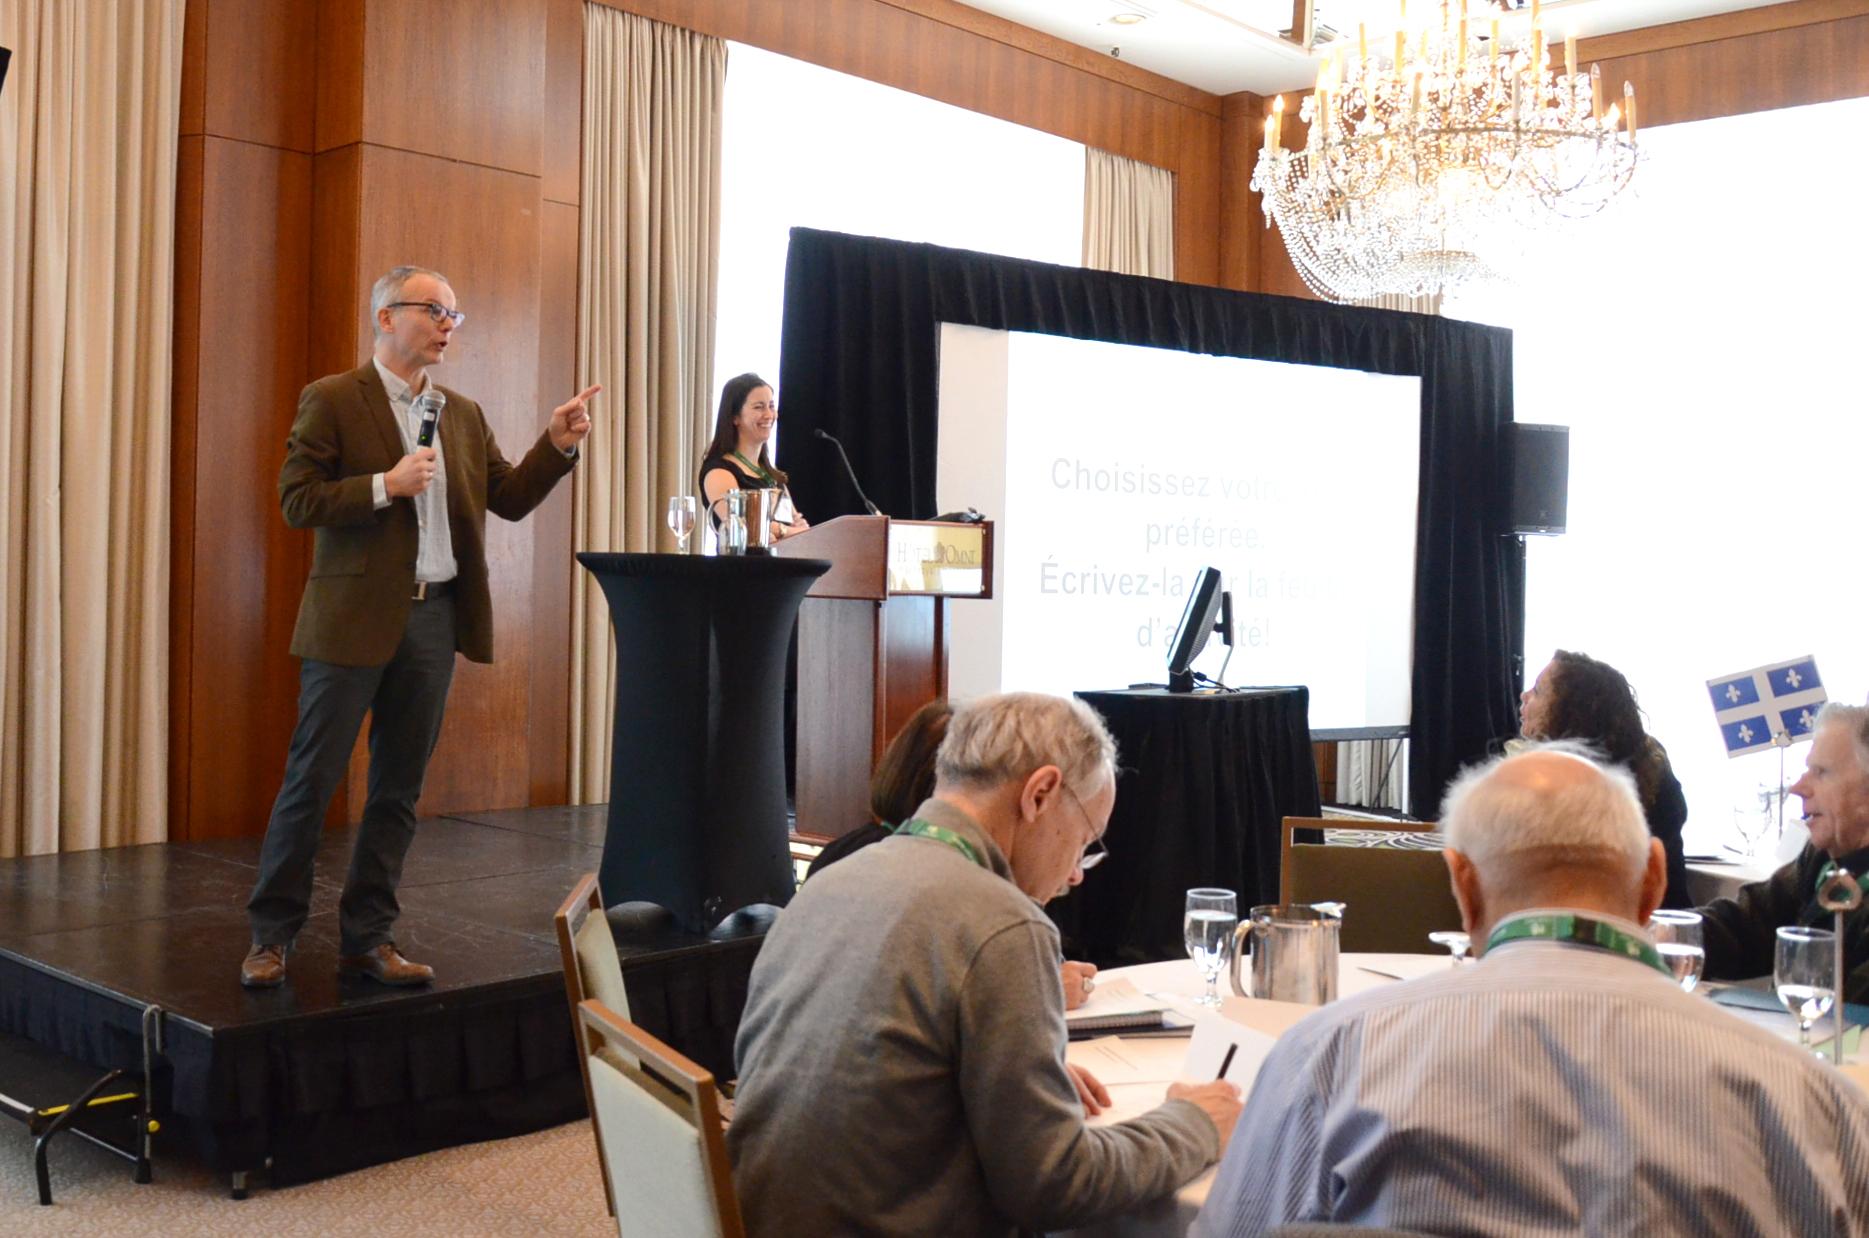 Crowdsourcing Bold Ideas for Maximum Impact  by Dr. Andrea Murphy & Dr. David Gardner, Executive Members, CaDeN, Nova Scotia